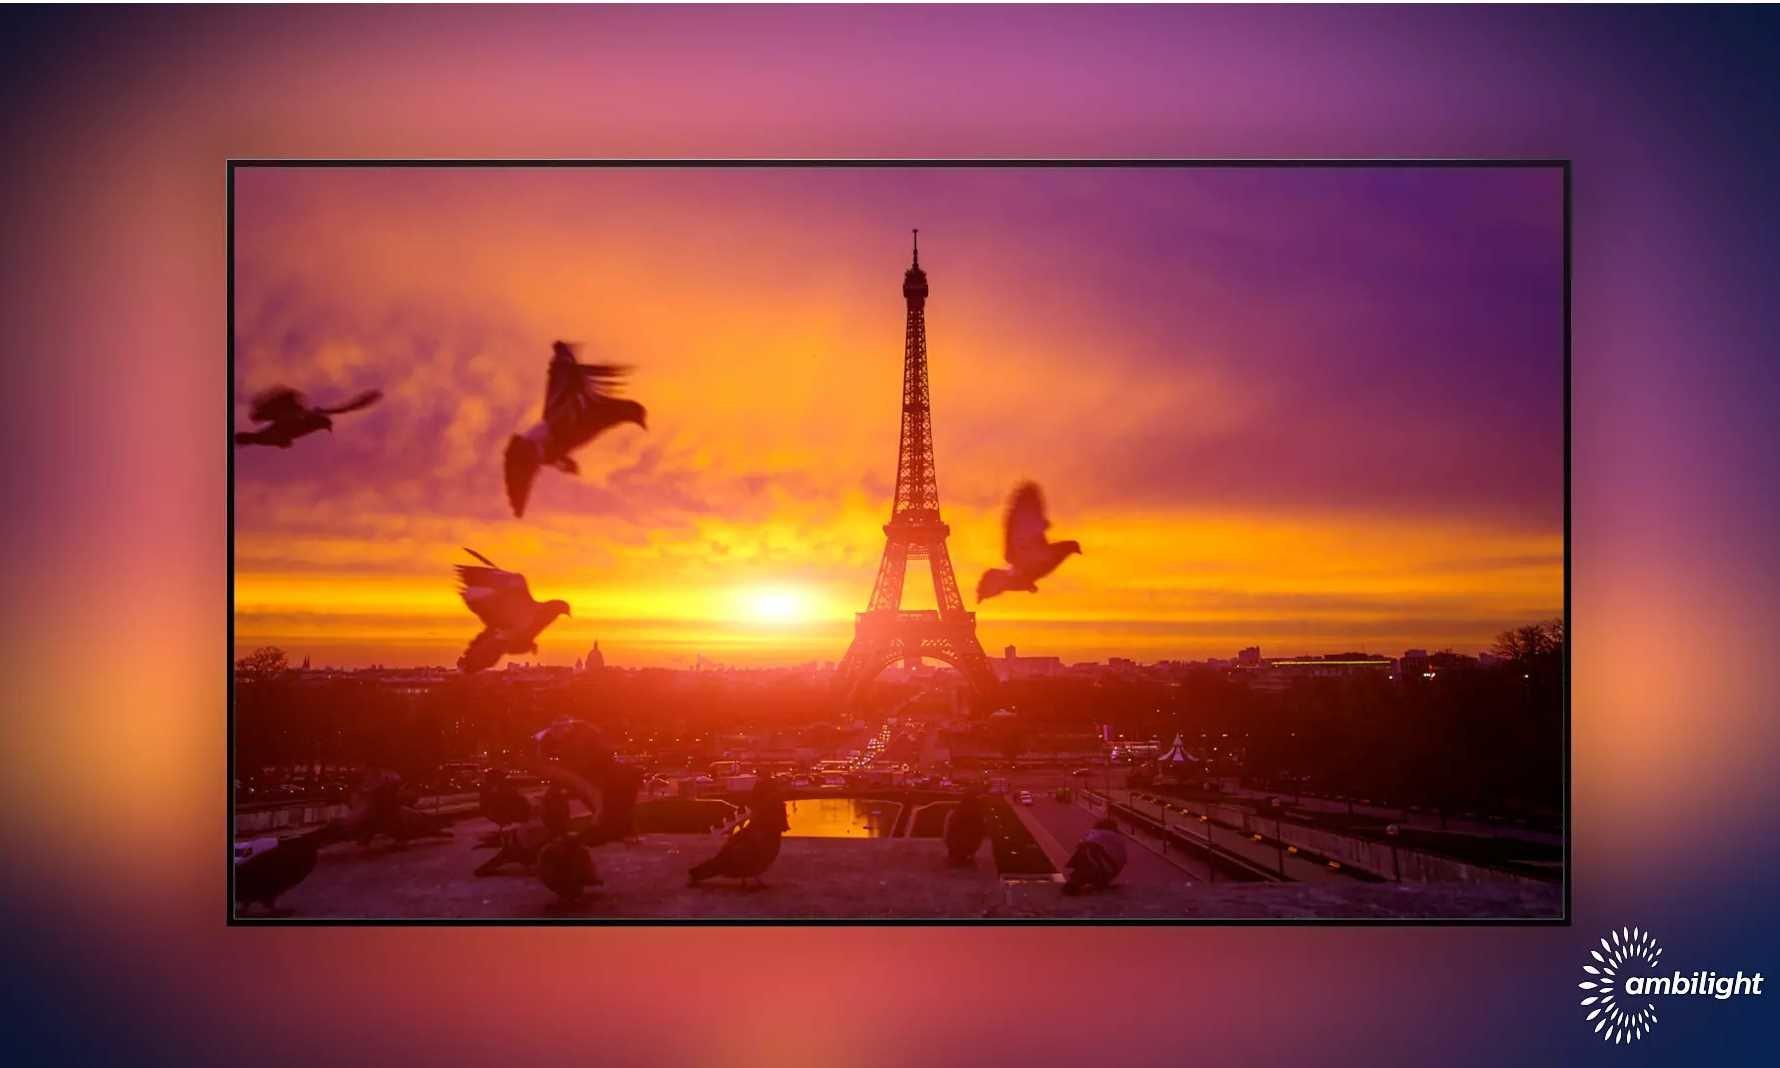 PHILIPS LED 43PUS7855 TV - Ambilight